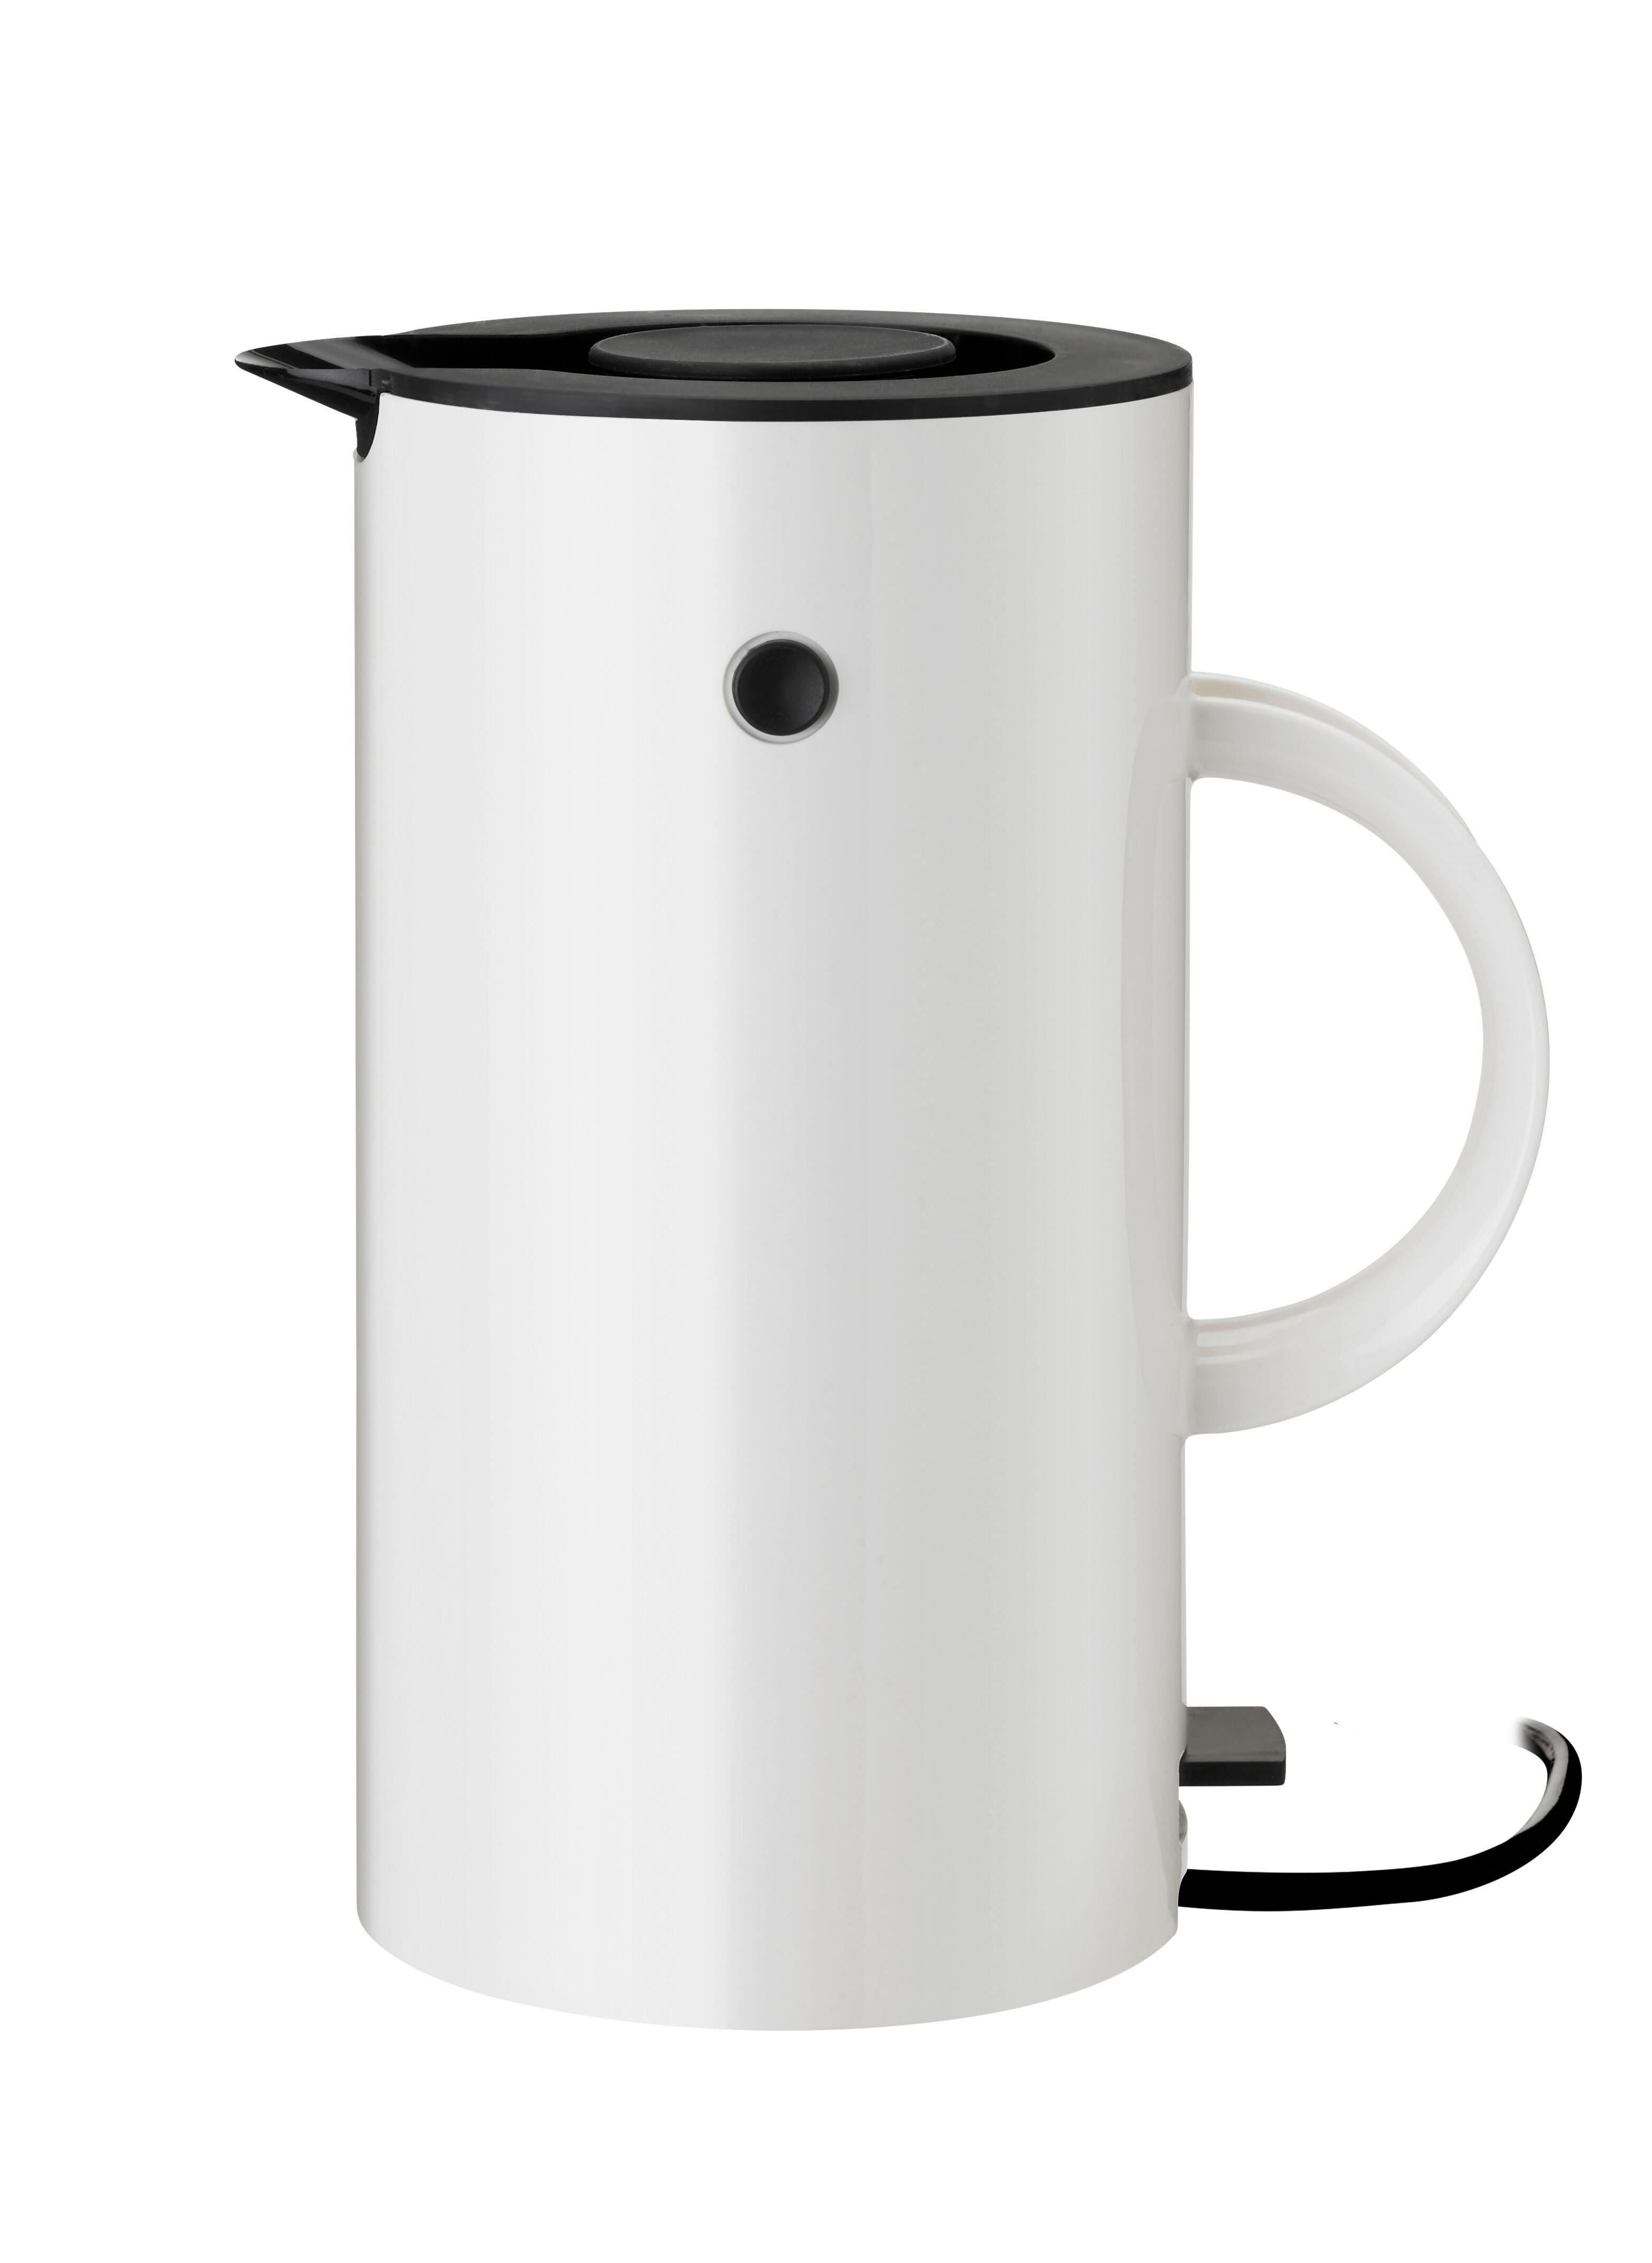 Stelton - EM77 Electric Kettle 1,5 L - White (890-1)